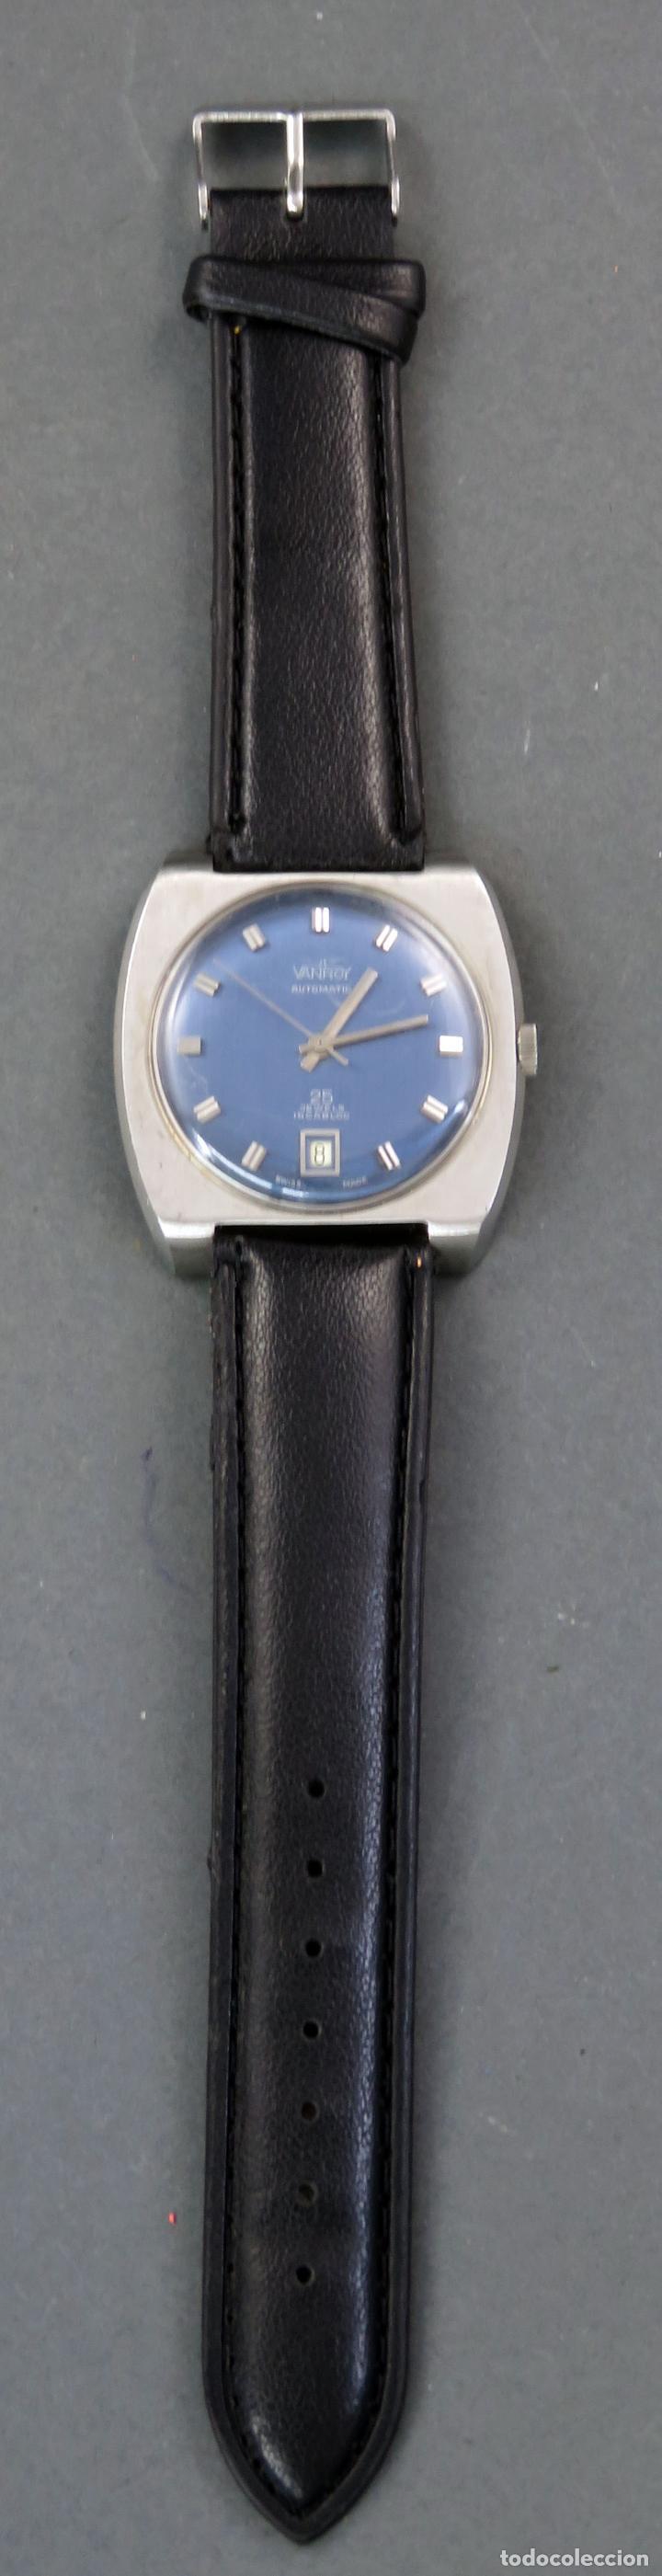 Relojes automáticos: Reloj automático Vanroy Automatic 25 jewels Incabloc Swiss Made Funciona - Foto 2 - 143166402